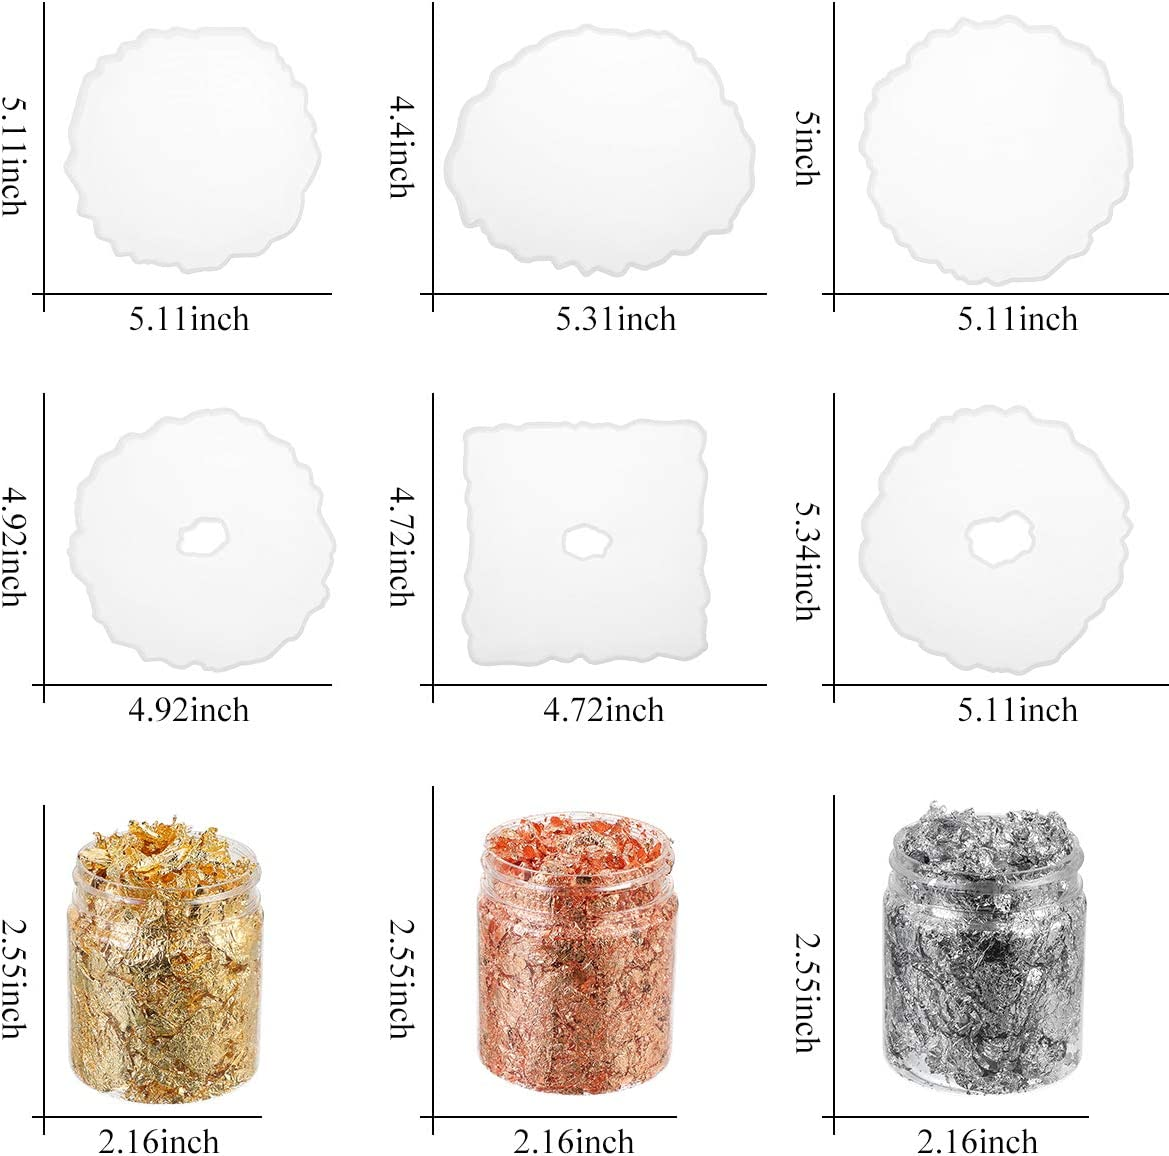 Cysincos 6 St/ück Unregelm/ä/ßig Untersetzer Silikonform Epoxidharz Form Coaster Resin Gie/ßformen Resin Mold Untersetzer Form Basteln DIY